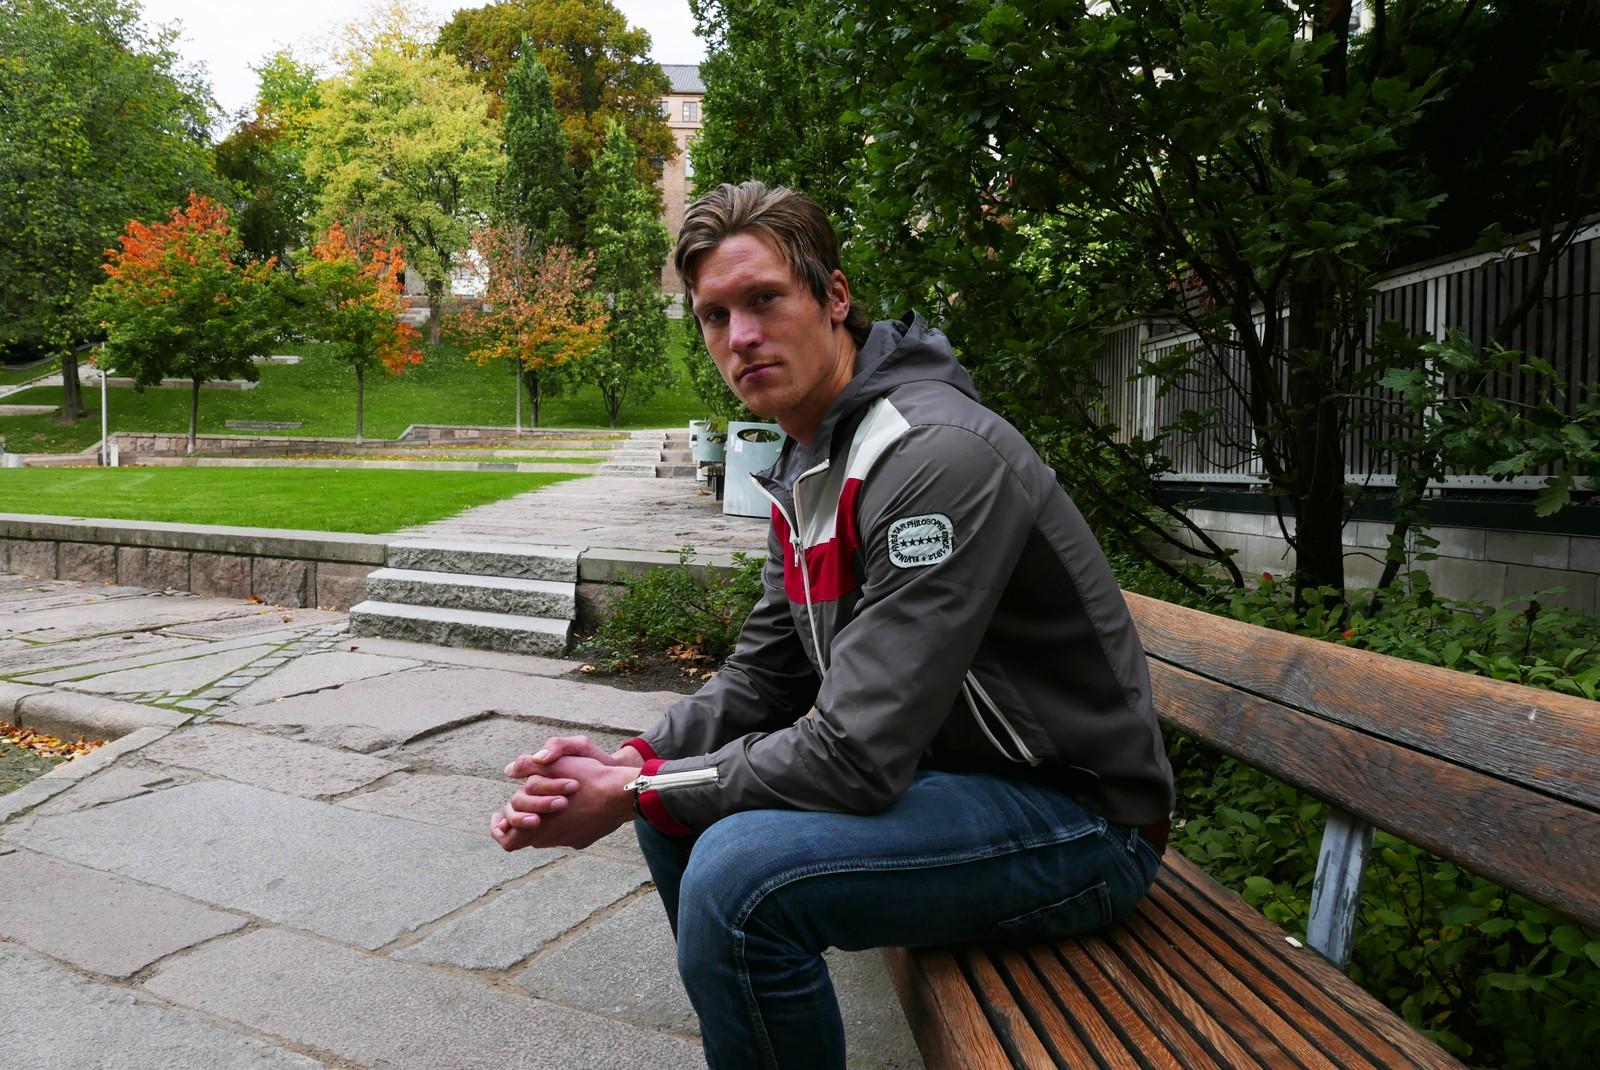 KOM SEG UNNA: Knut Sande var en av de fire andre som syklet sammen med Petter da ulykken skjedde. Knut kom seg unna, det rakk ikke Petter.